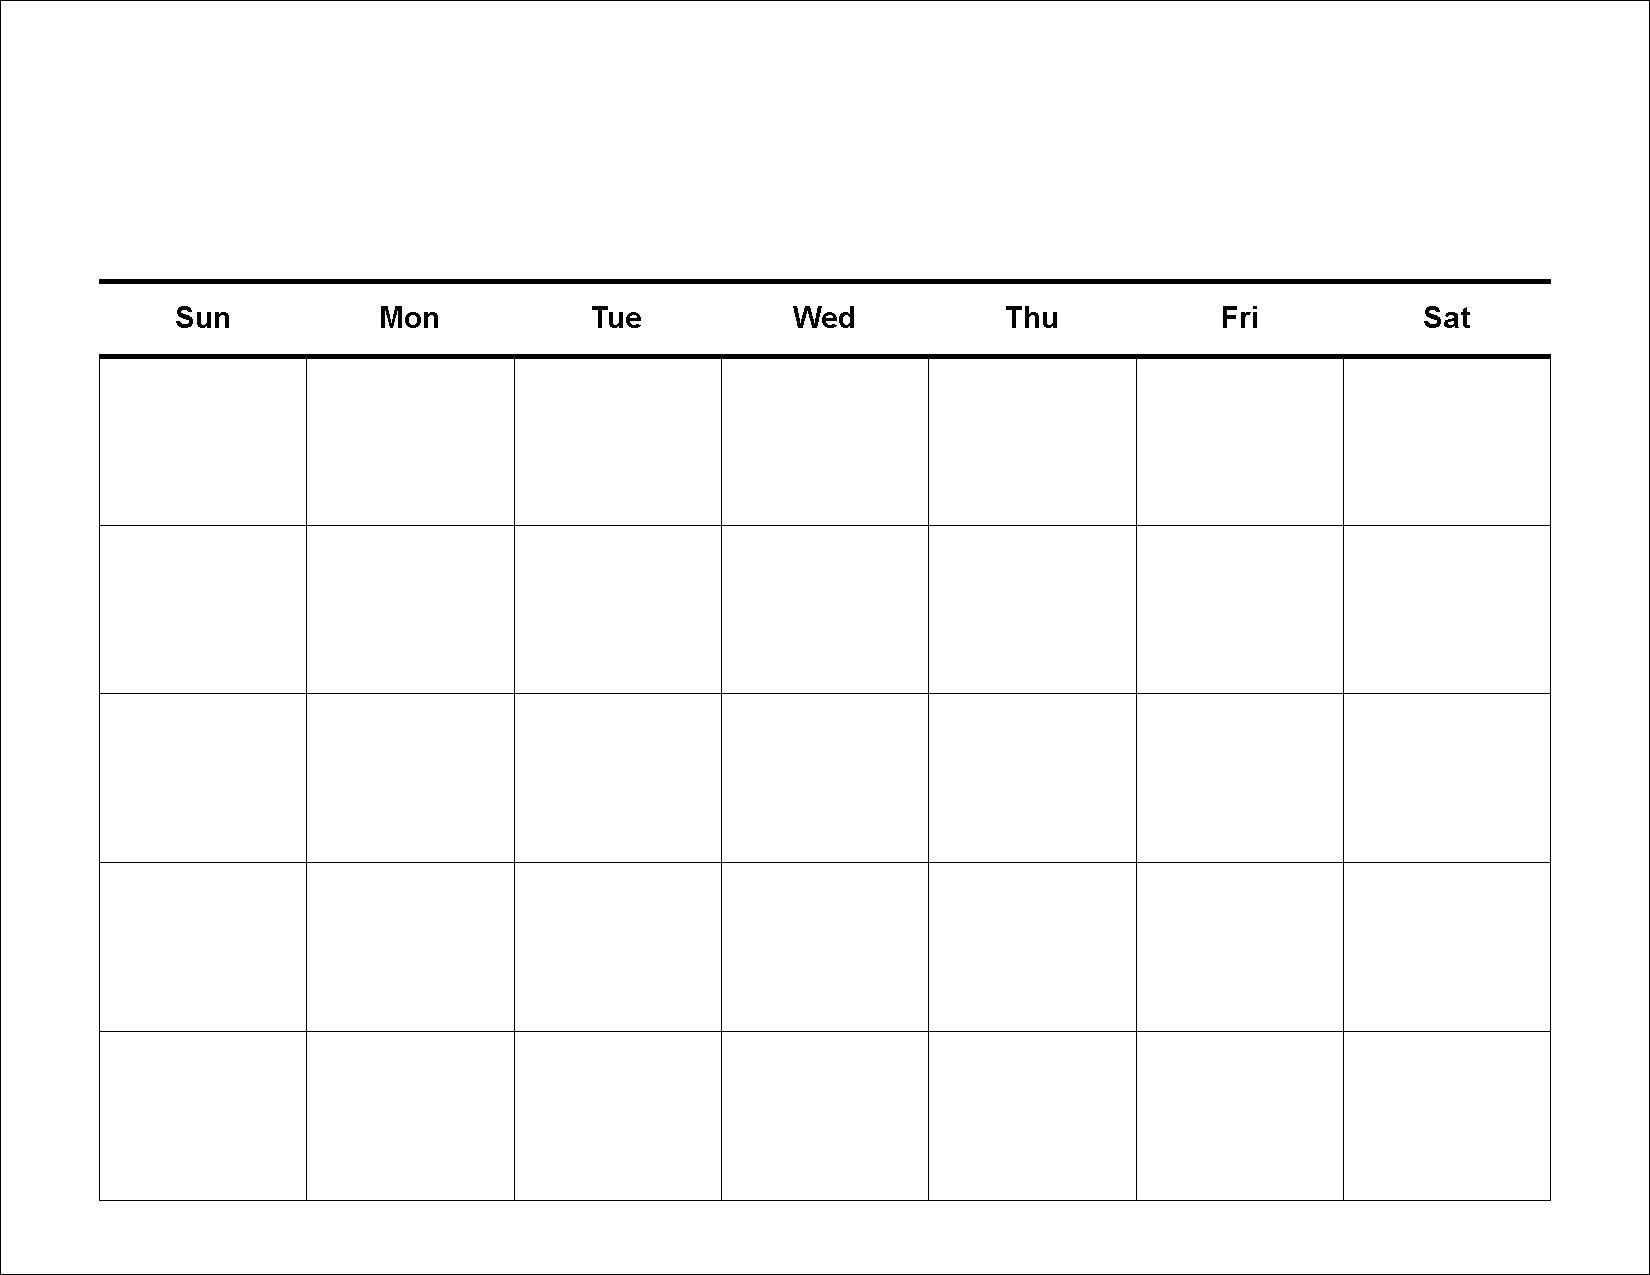 30 Day Blank Calendar Template 2 Week Blank Calendar-Blank Template For 30 Days